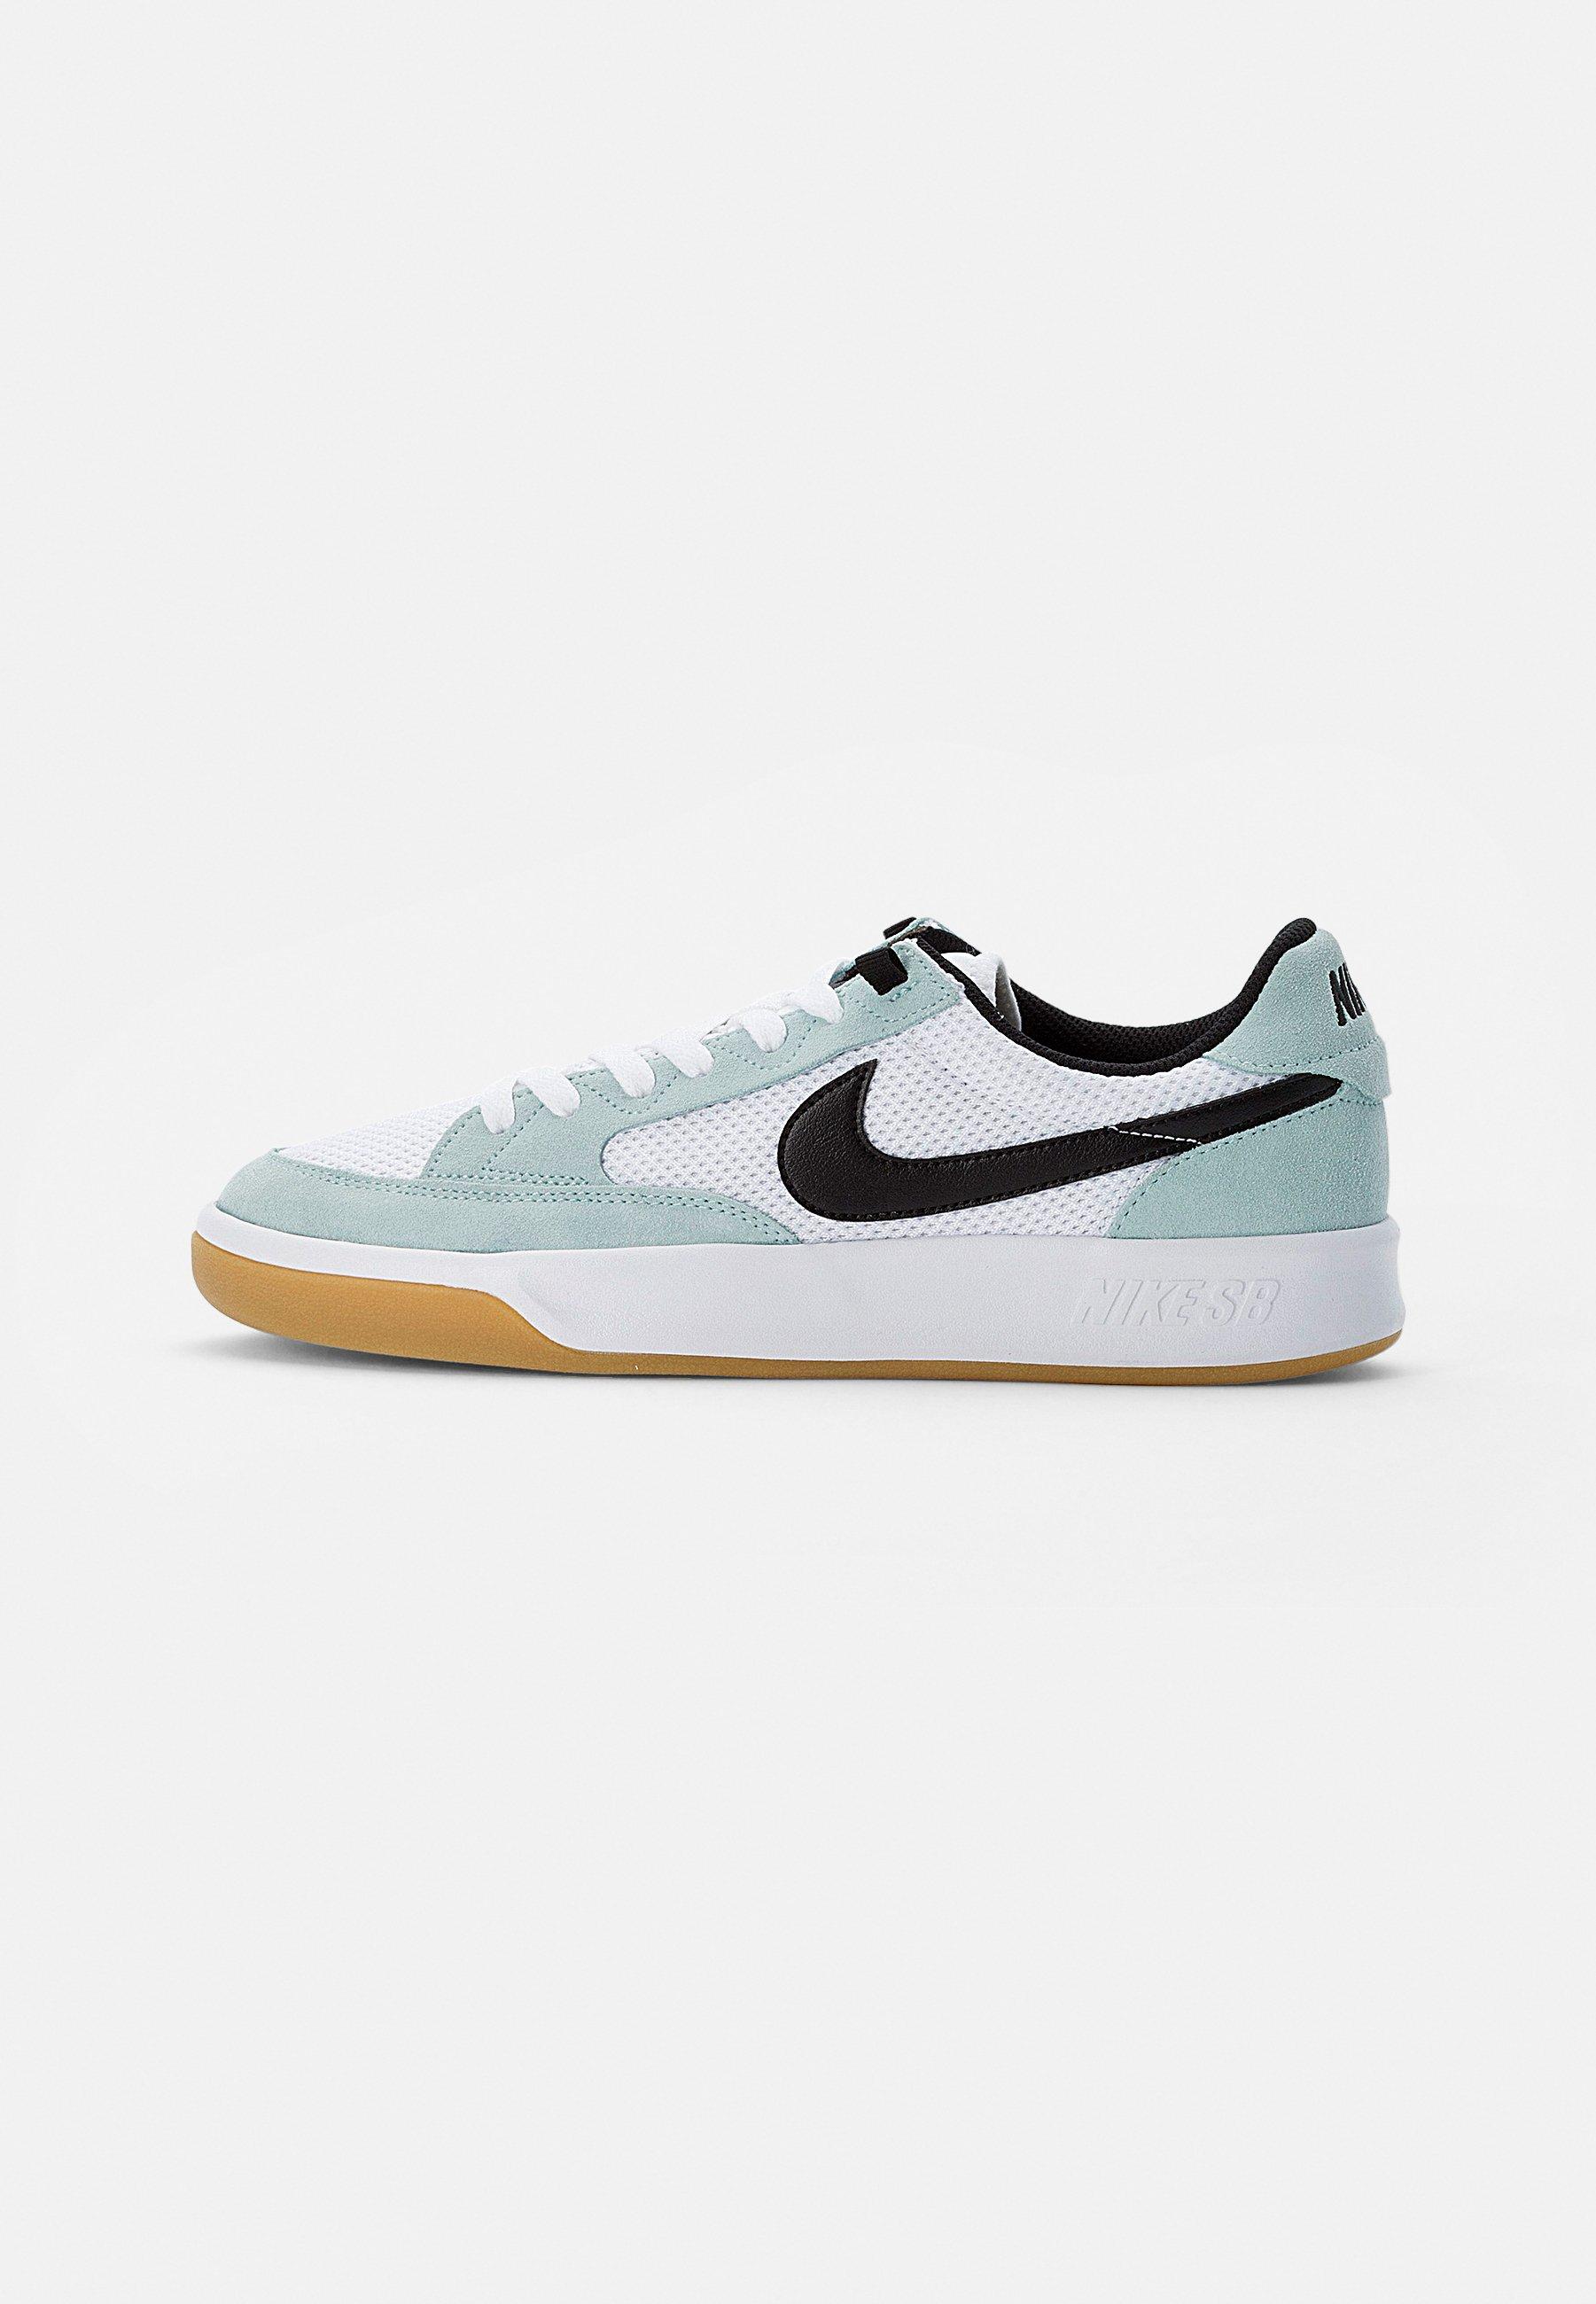 ADVERSARY UNISEX - Skate shoes - light dew/black-white-gum light brown